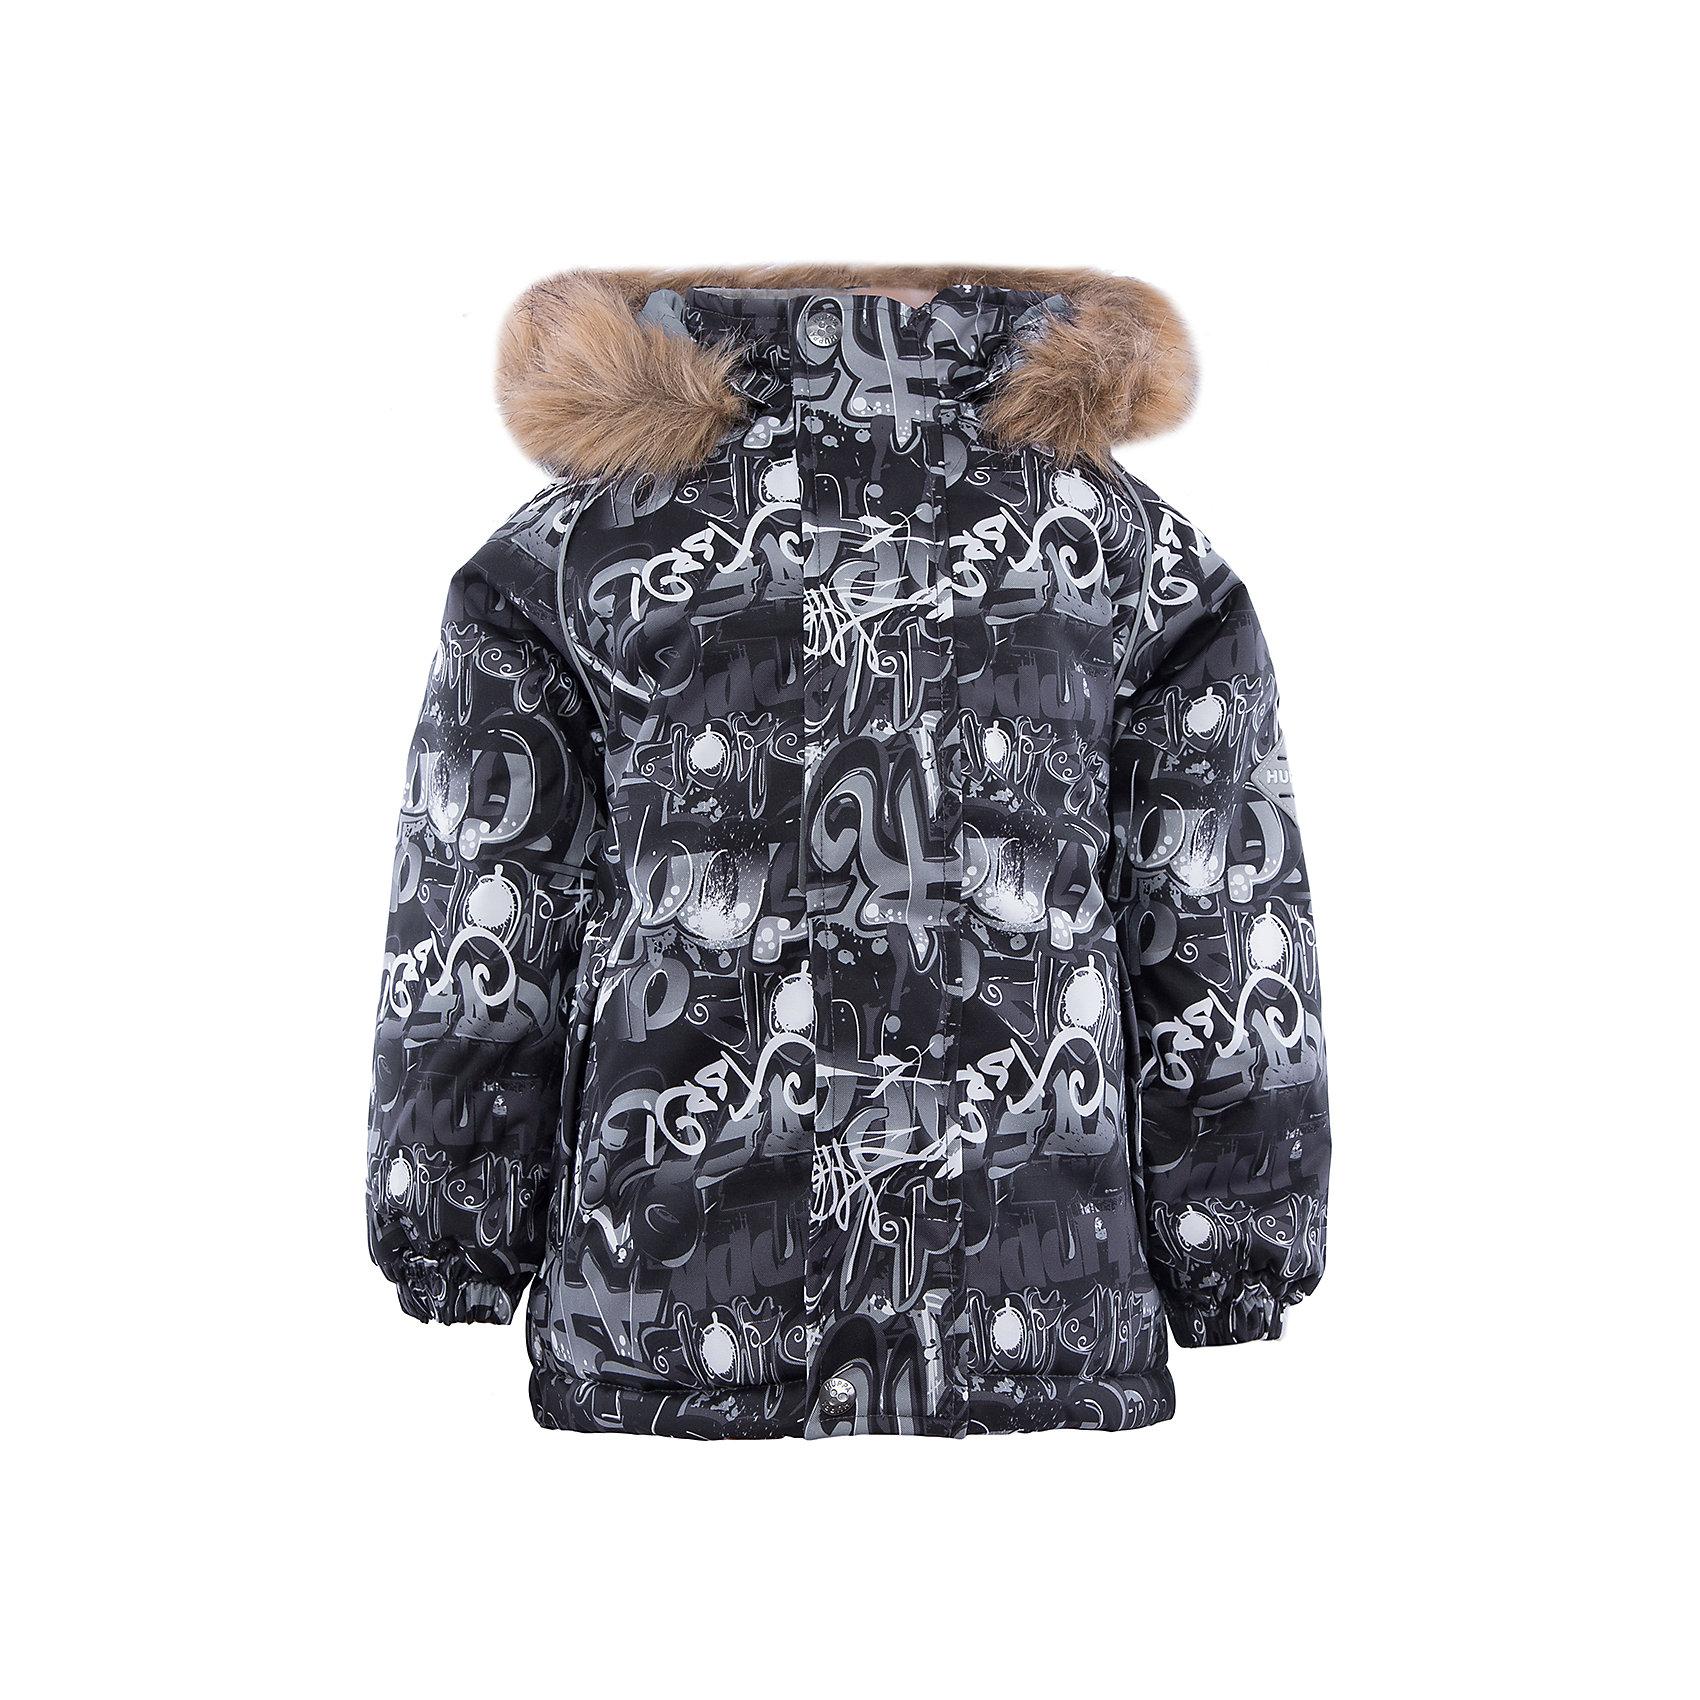 Huppa Куртка   для мальчика Huppa куртка для мальчика huppa jody цвет серый белый желтый 17000004 73148 размер 140